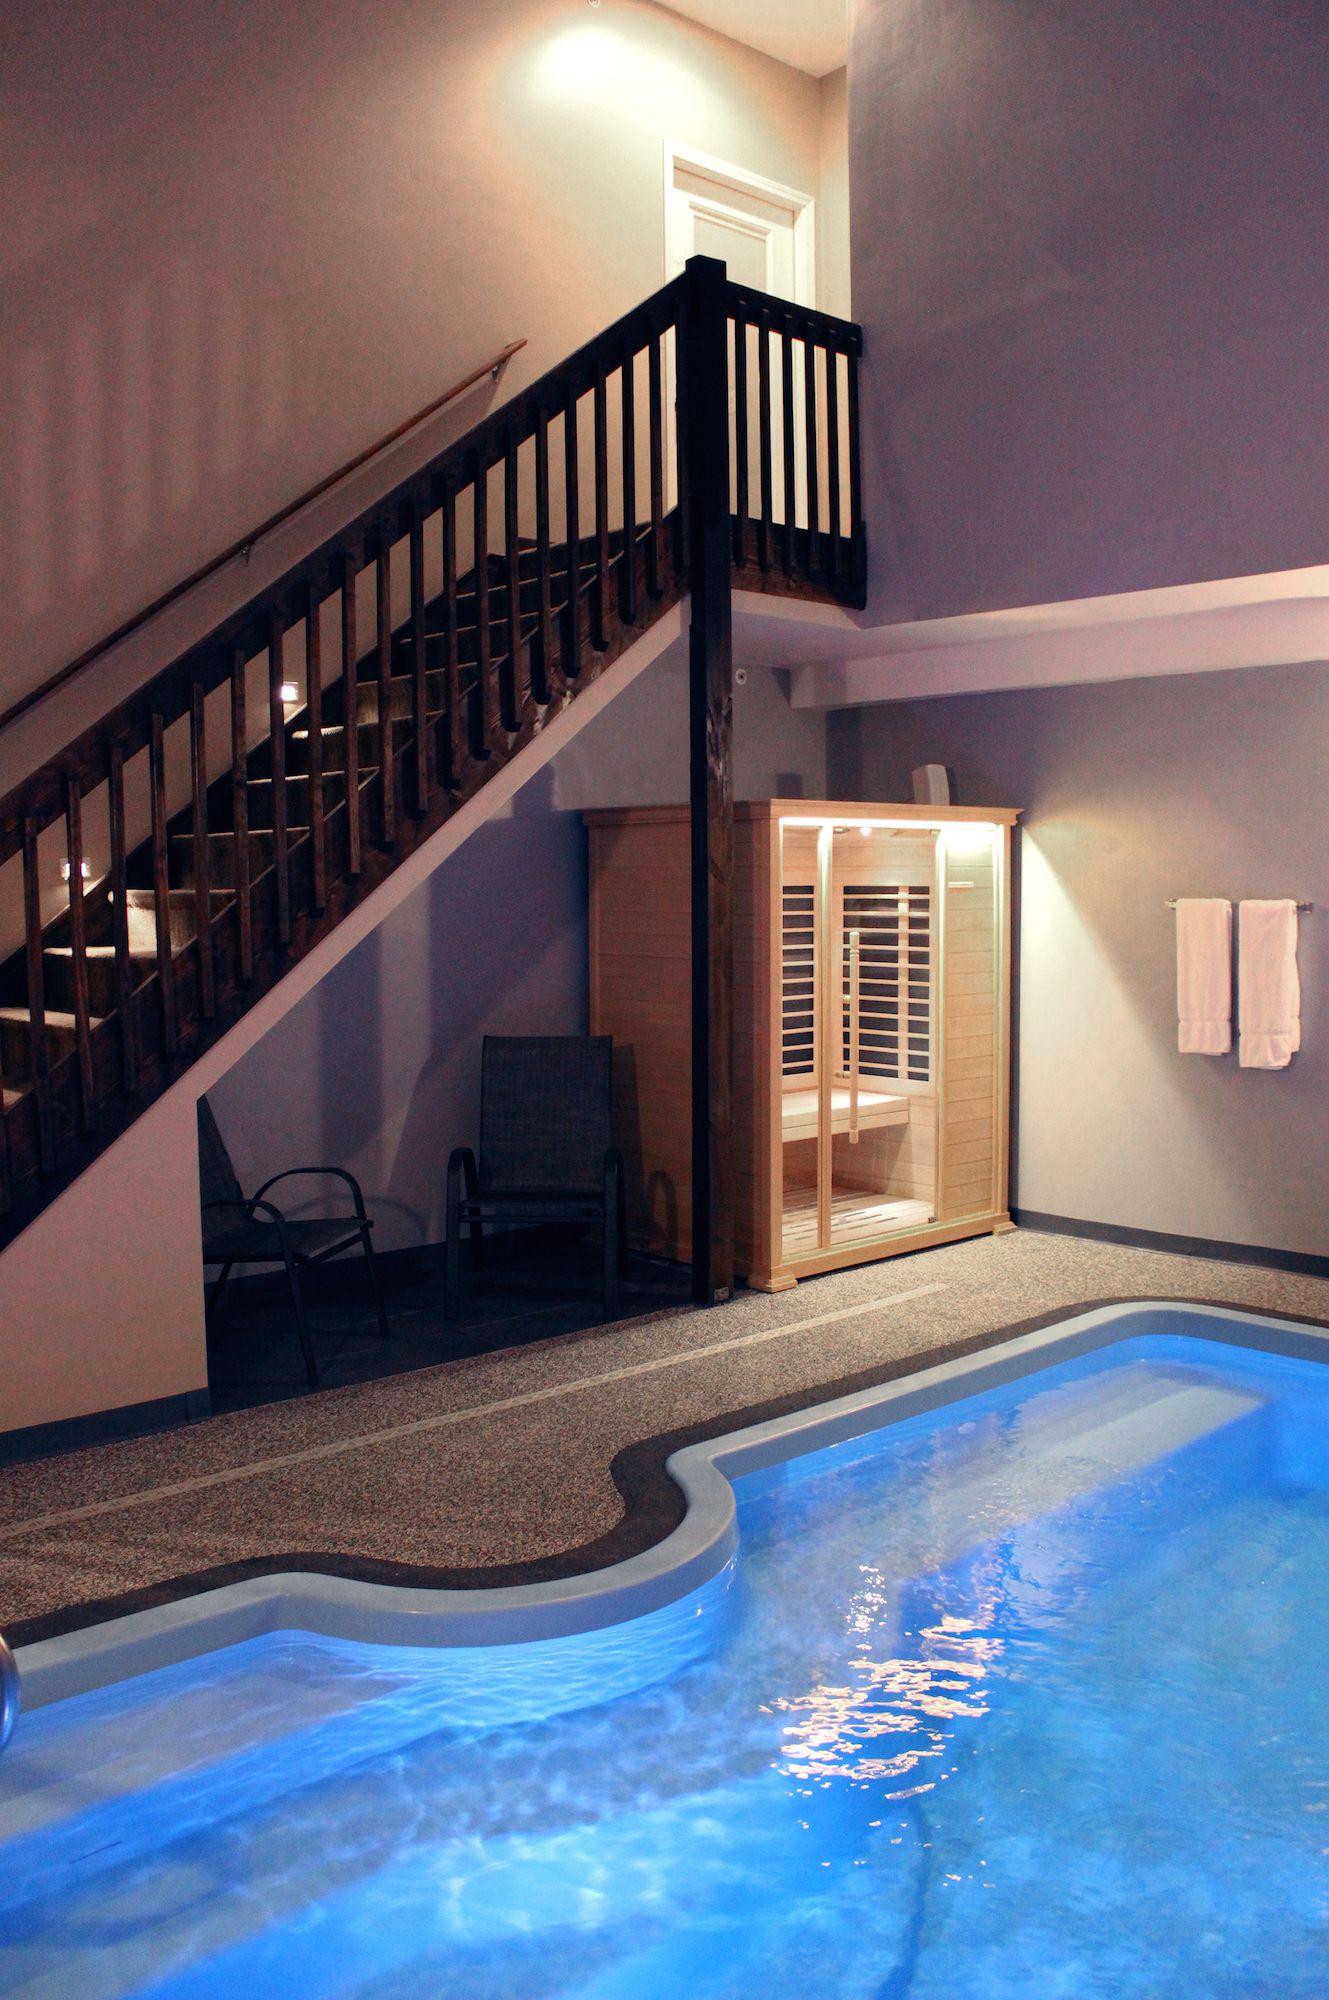 Belamere Suites The Grand Royal Swimming Pool Suite Swimming Pool In Room Perrysburg Ohio Romantic Hotel Rooms Romantic Hotel Suites Ohio Hotels